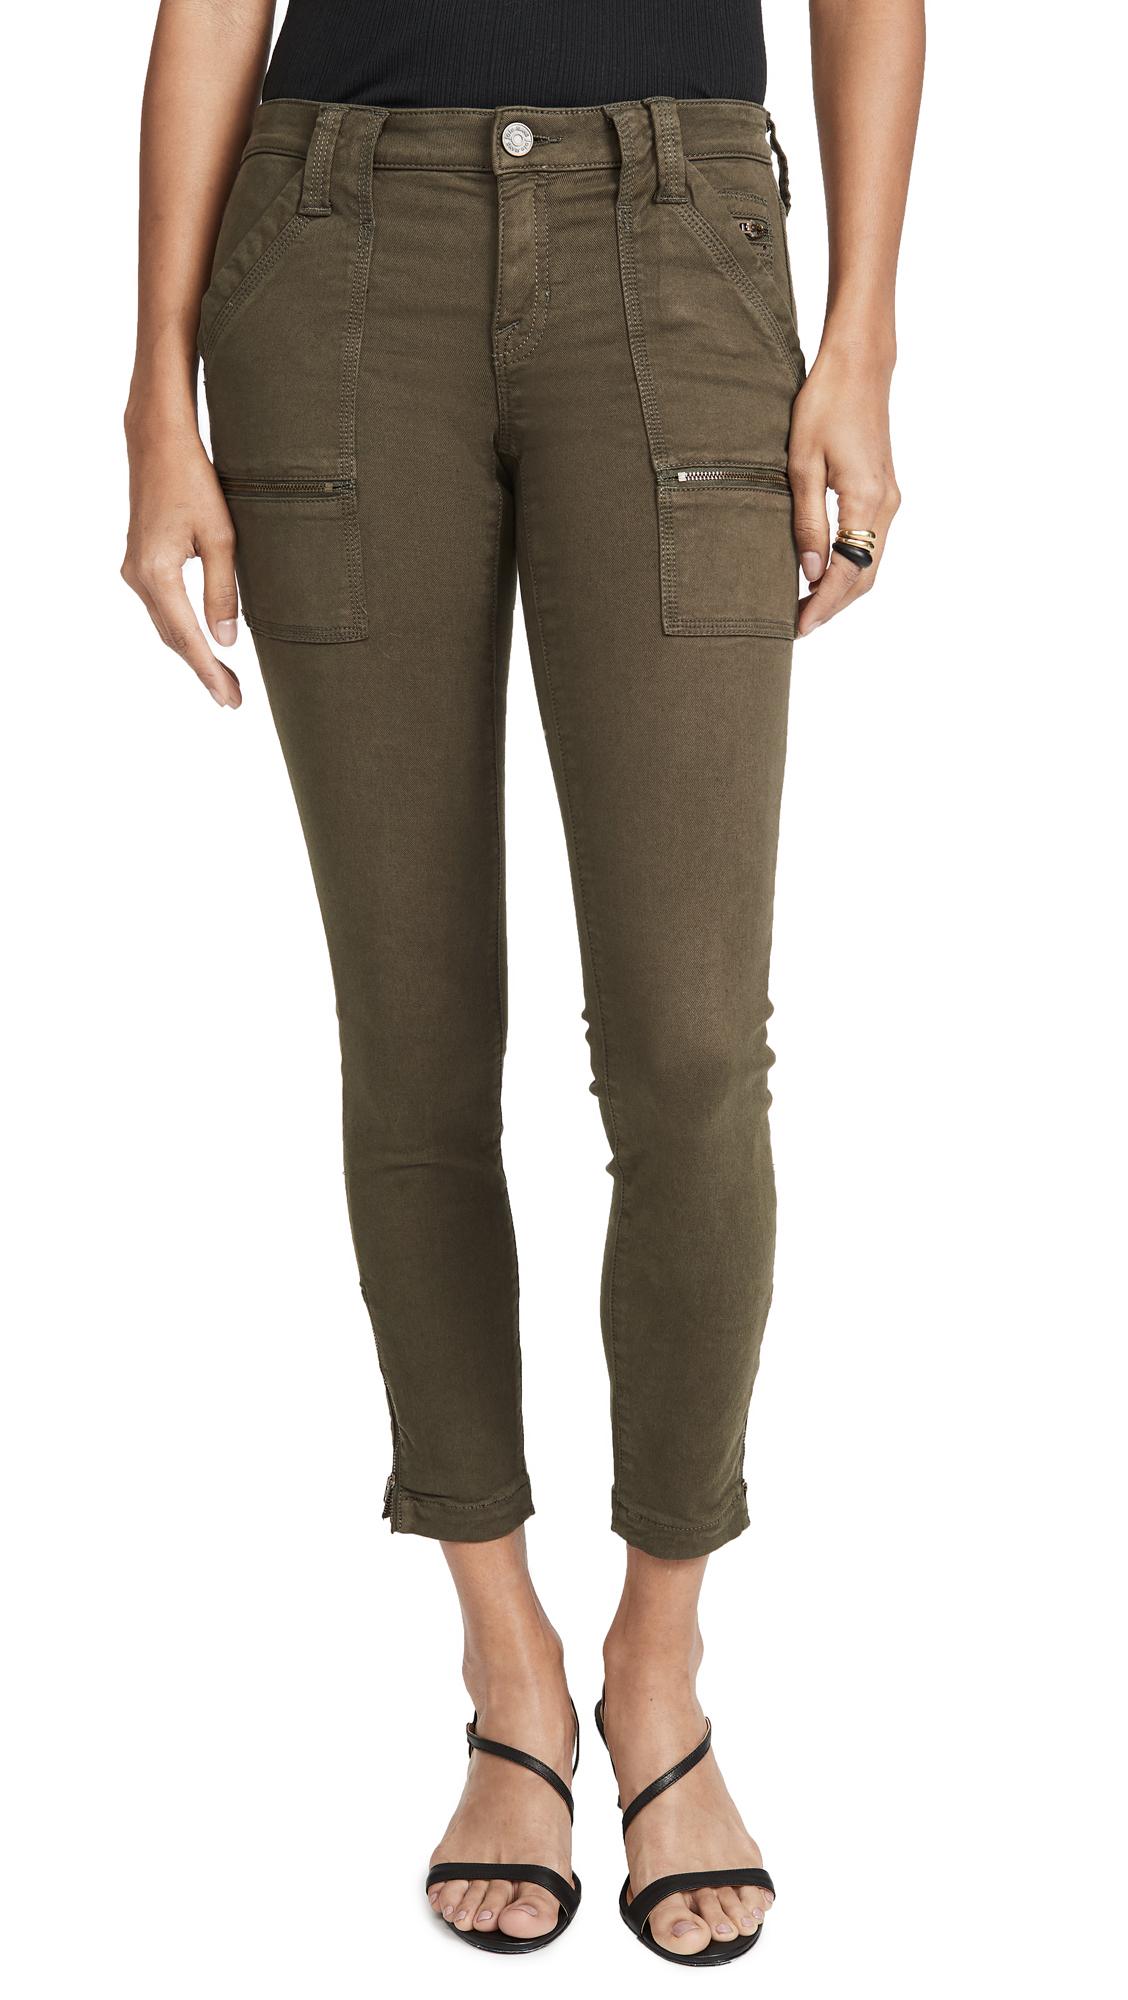 Joie Park Skinny Utility Cargo Pants